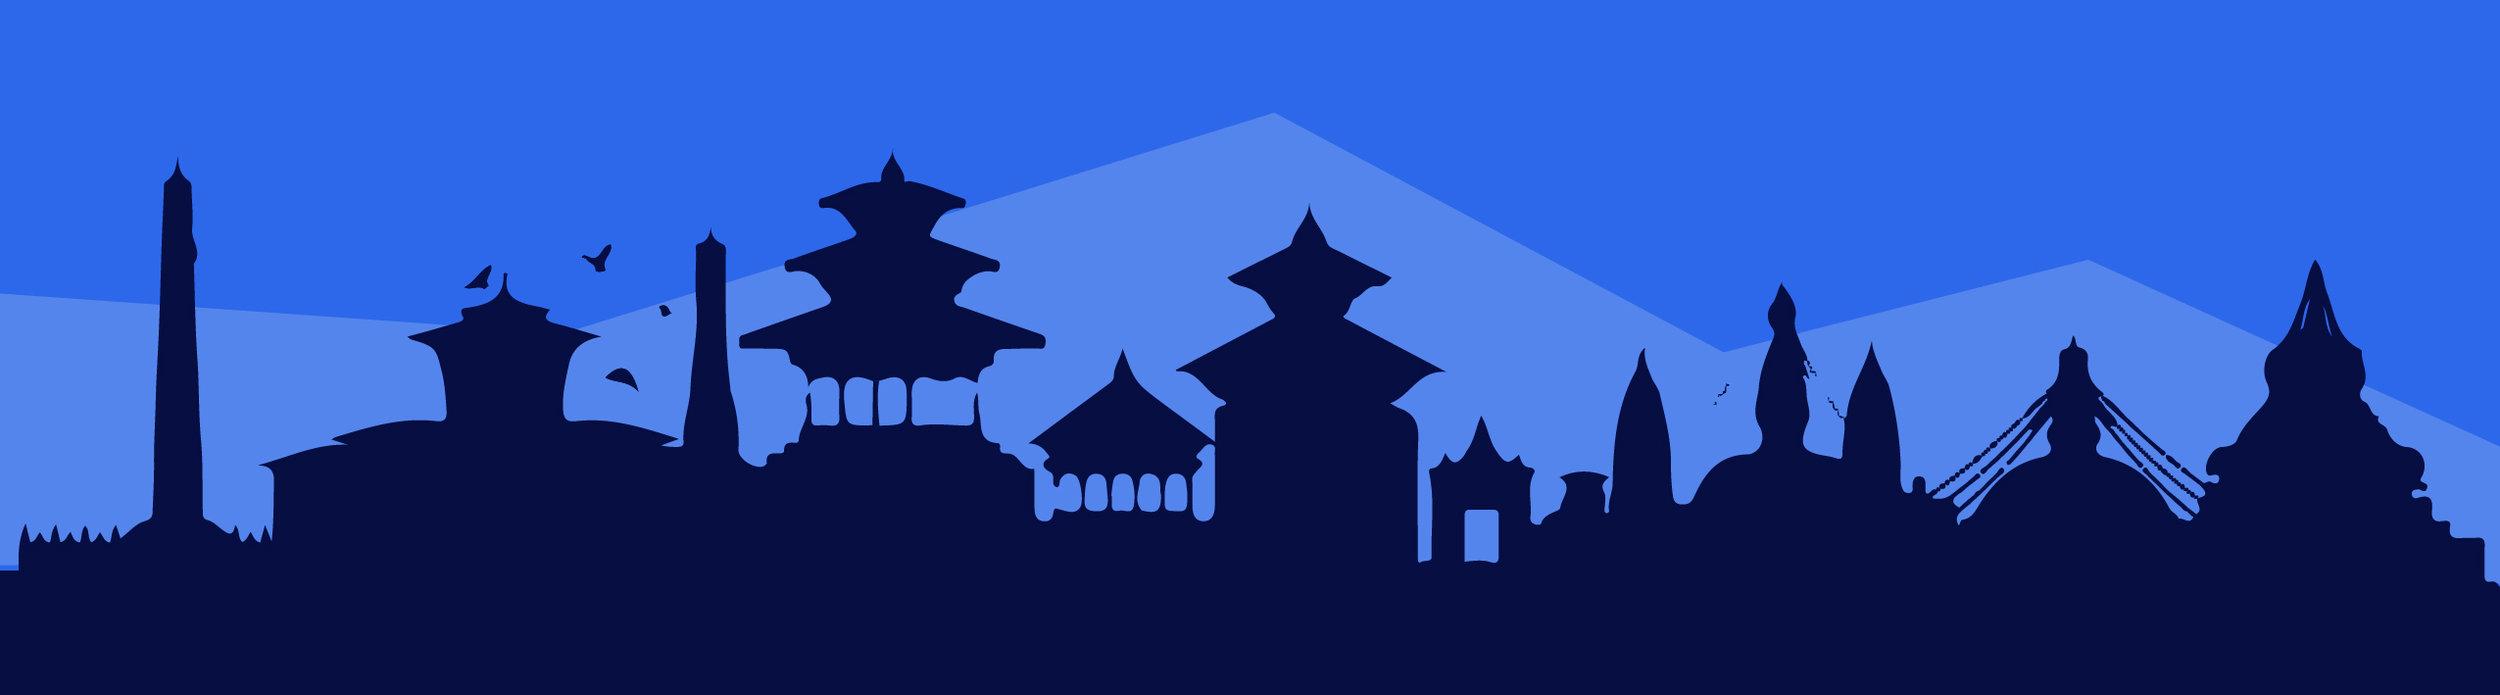 NEPAL IMPACT - 11th November - 17th November 2019